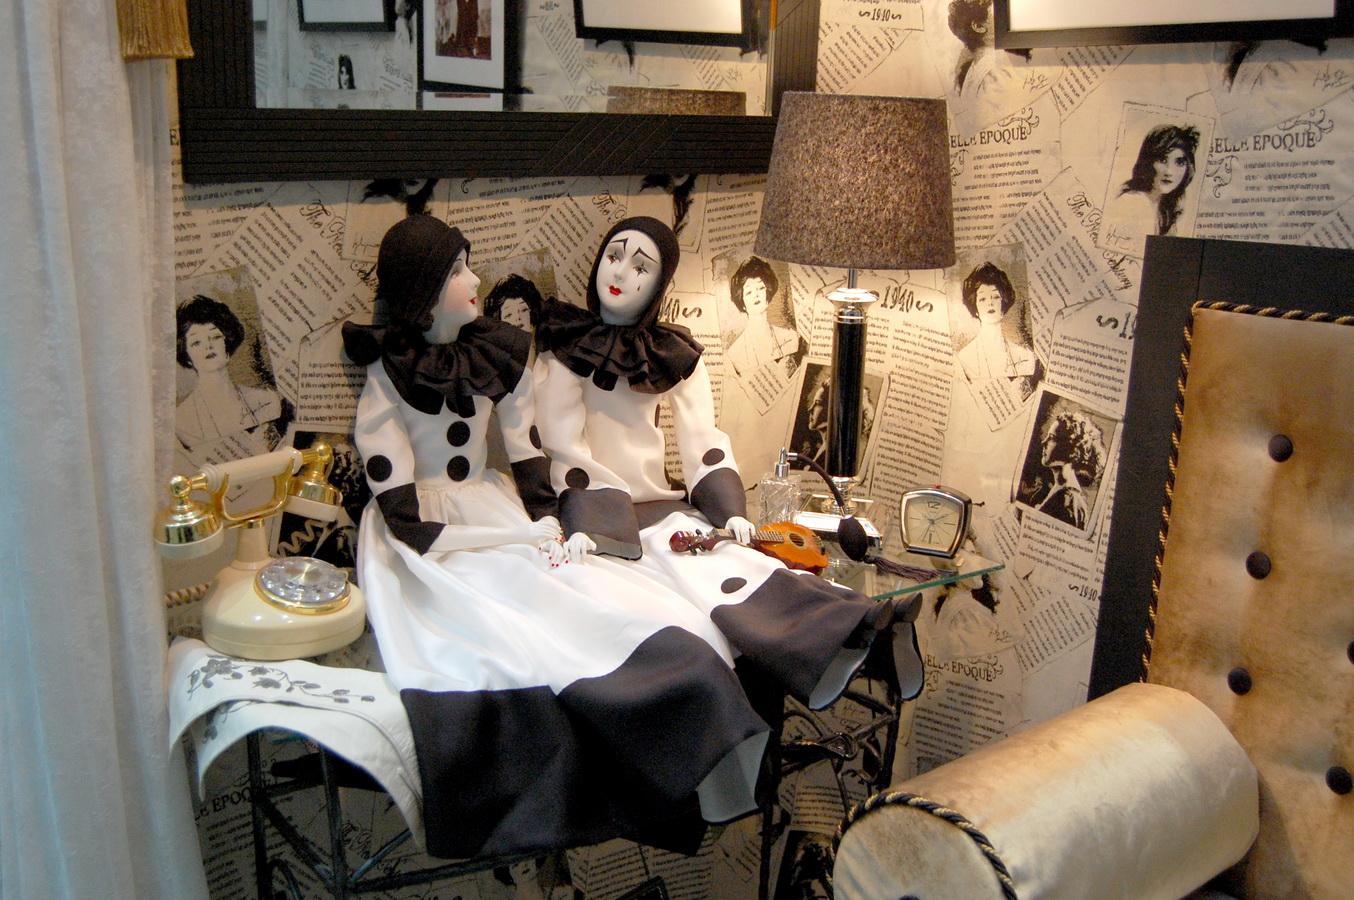 фотография будуарных кукол пьеро и пьеретта